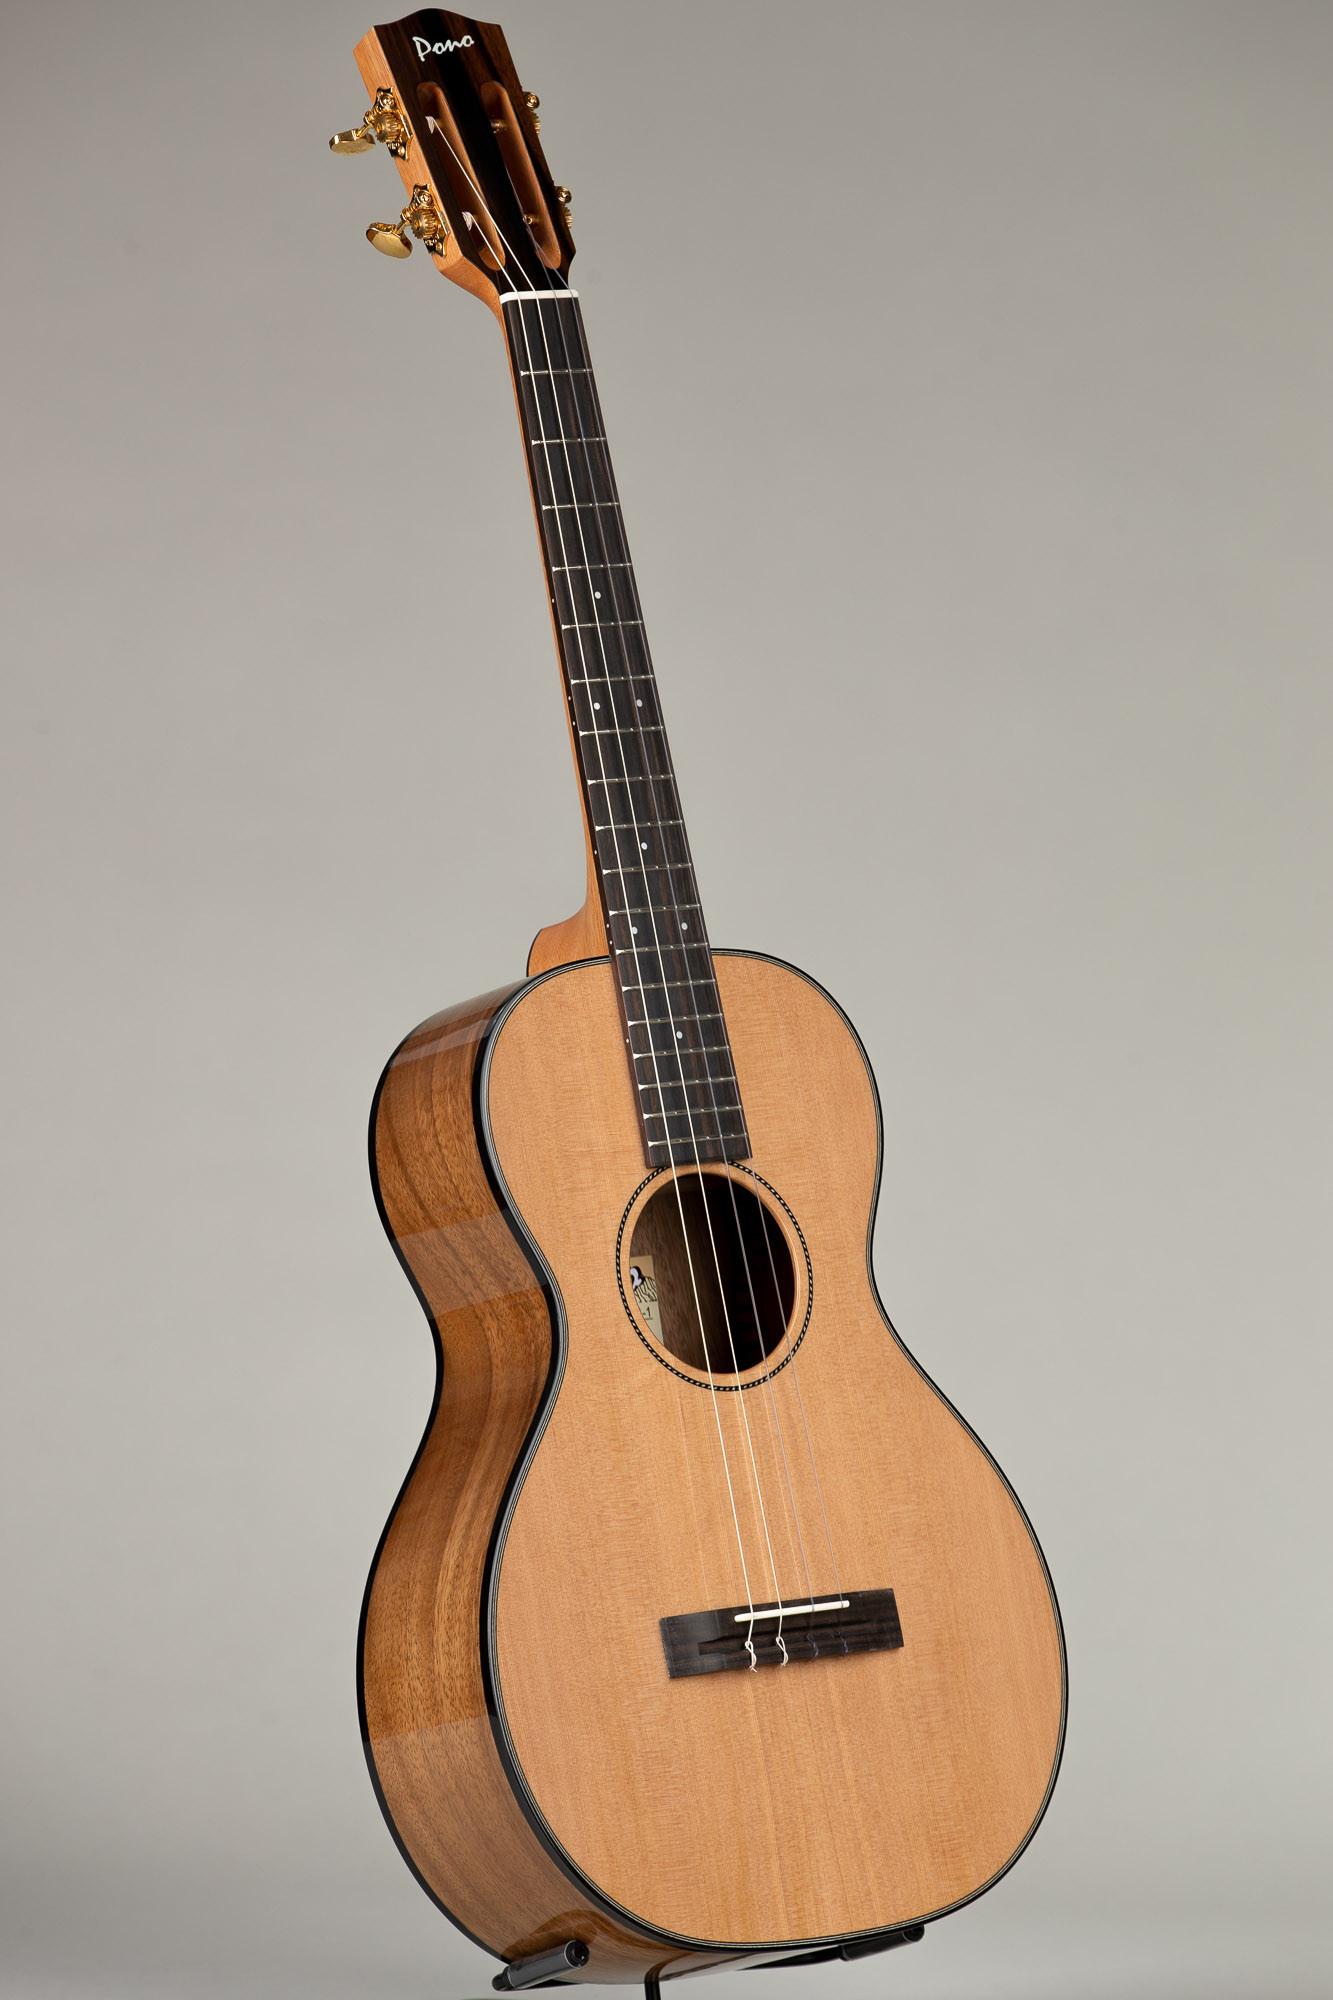 Pono Cedar Top Acacia UL Baritone (UL4N-1 3200)